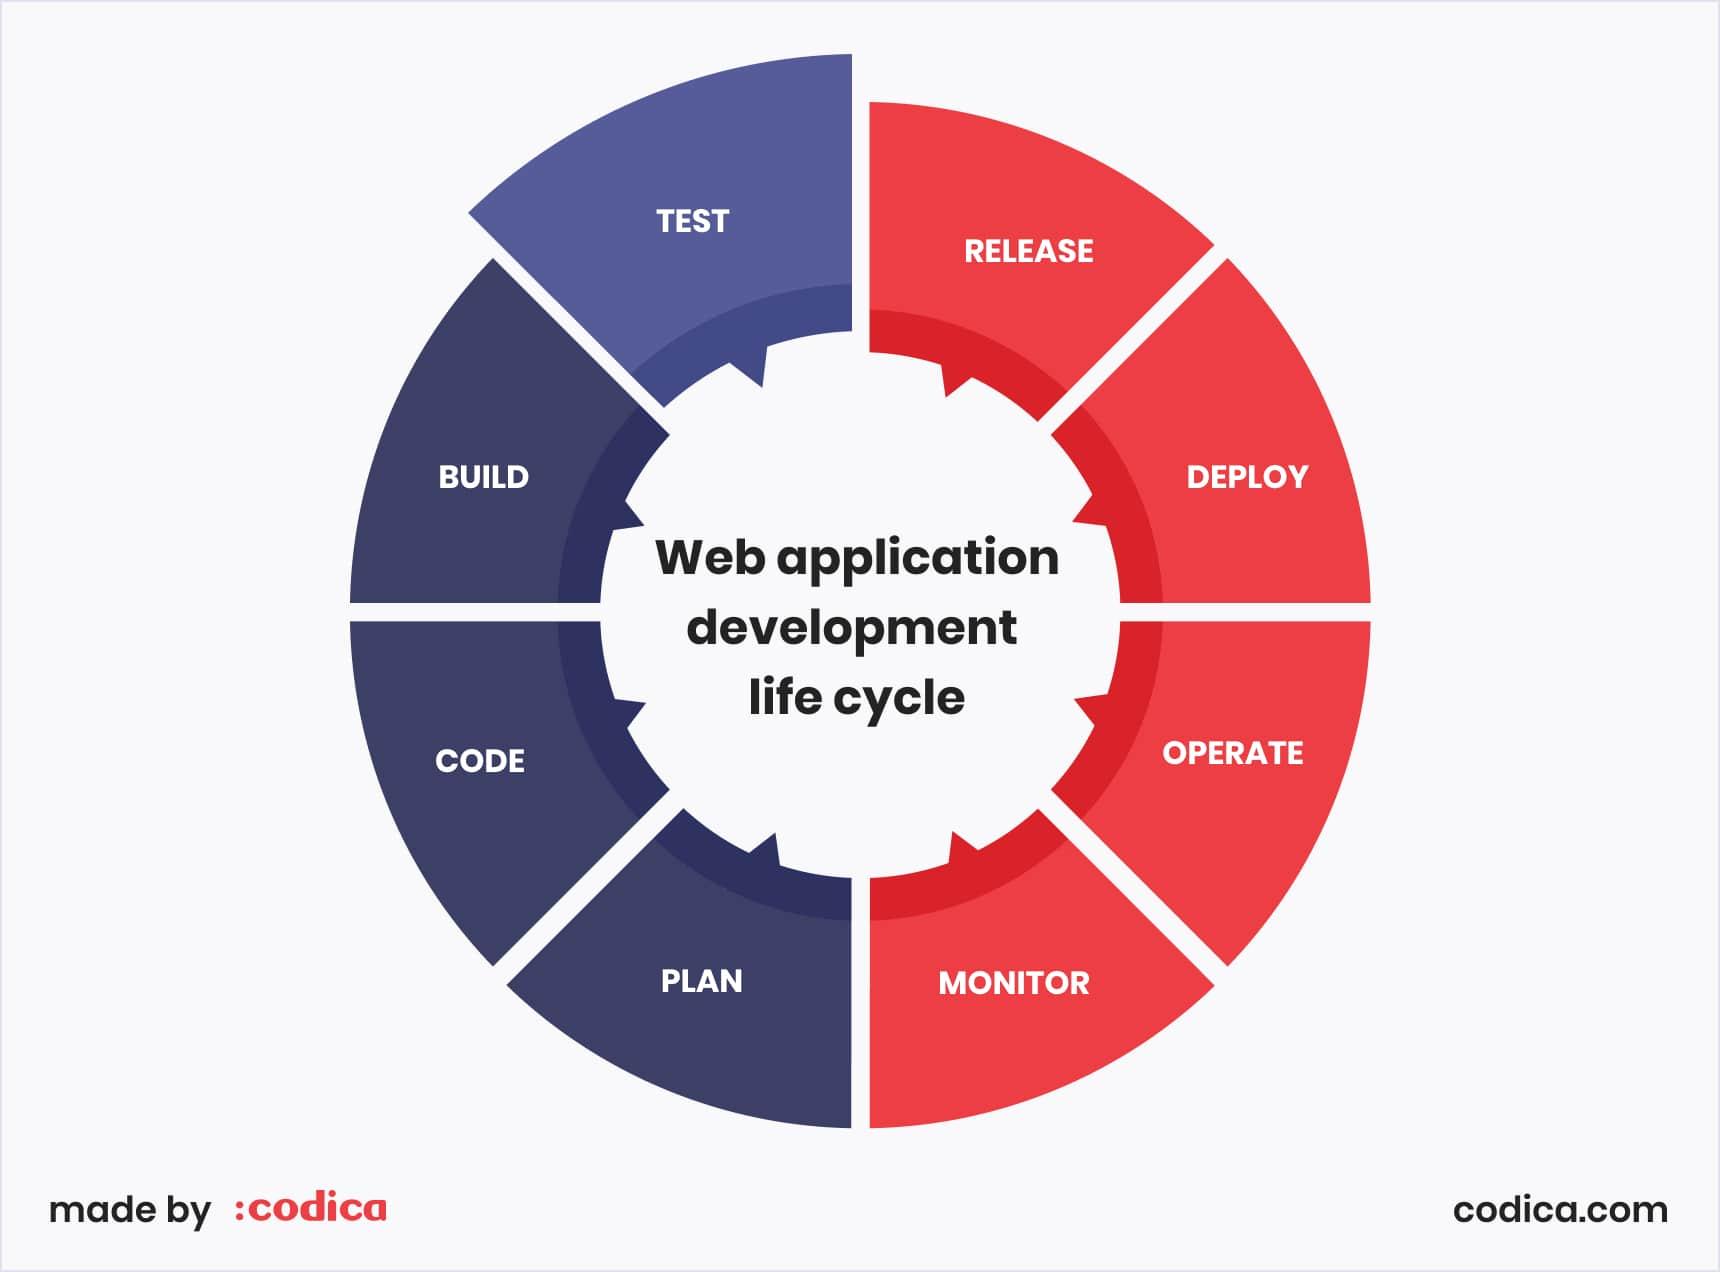 Web application development life cycle | Codica